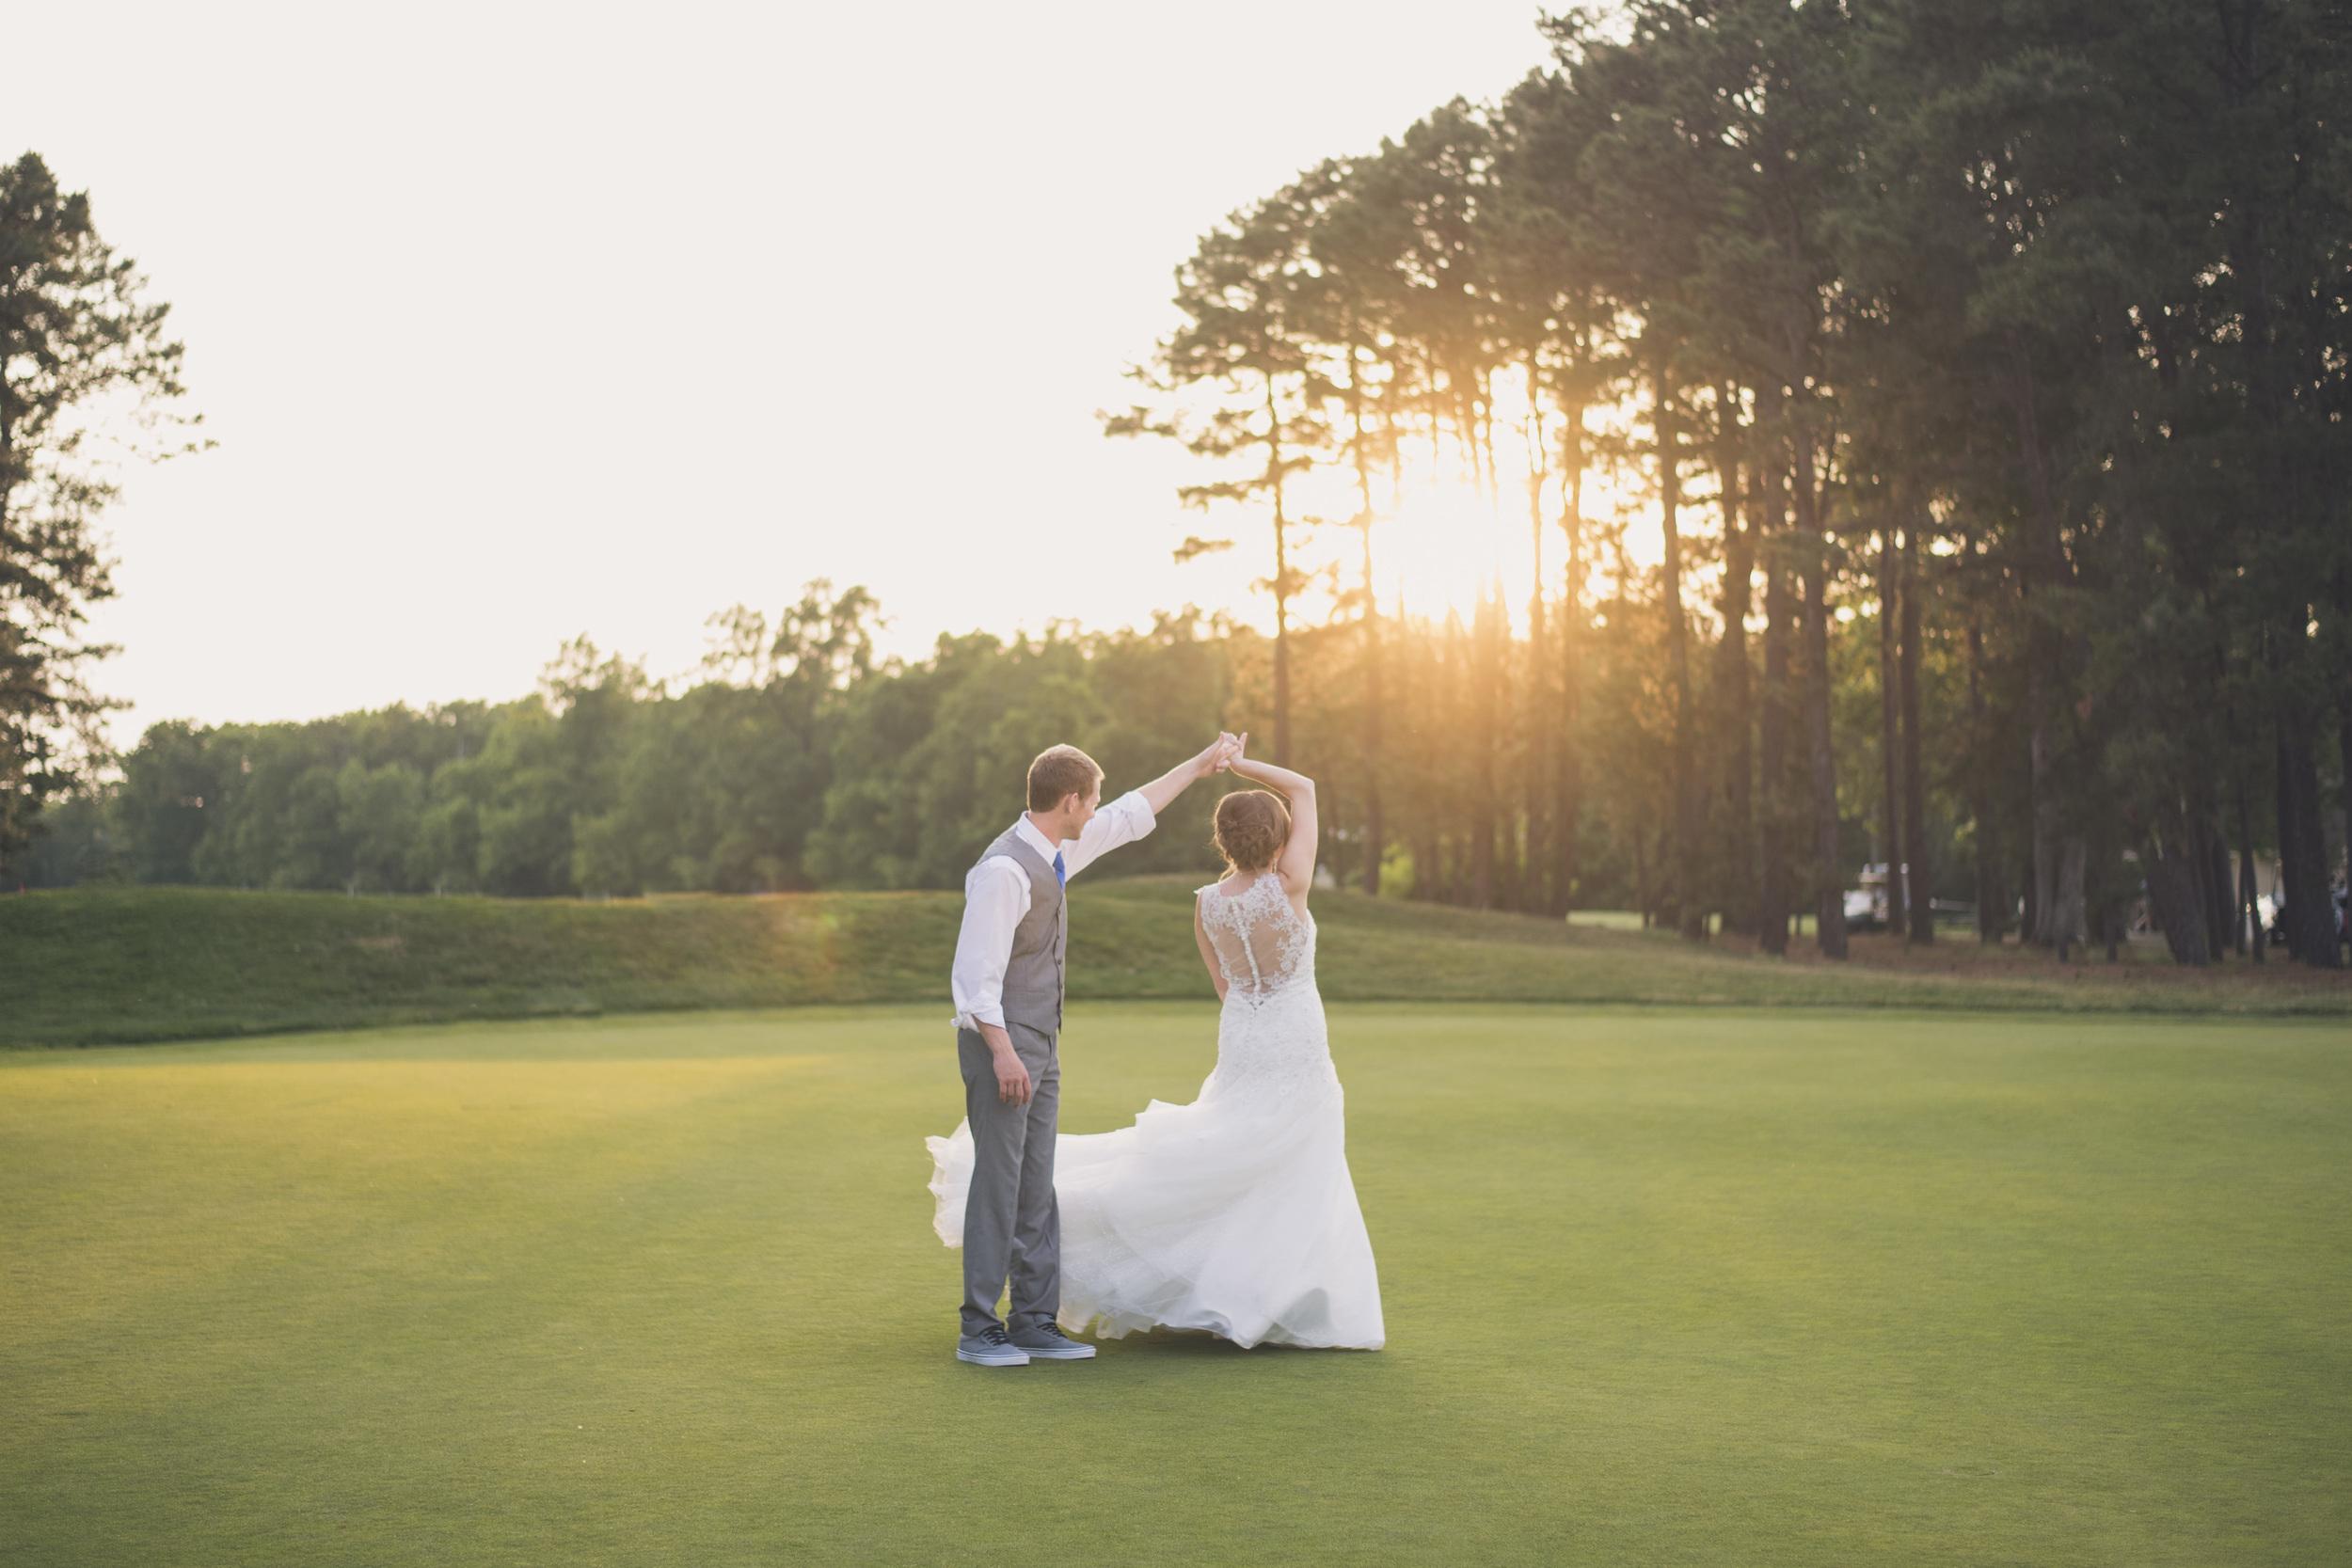 New_jersey_blue_heron_pines_wedding20150529_0603.jpg